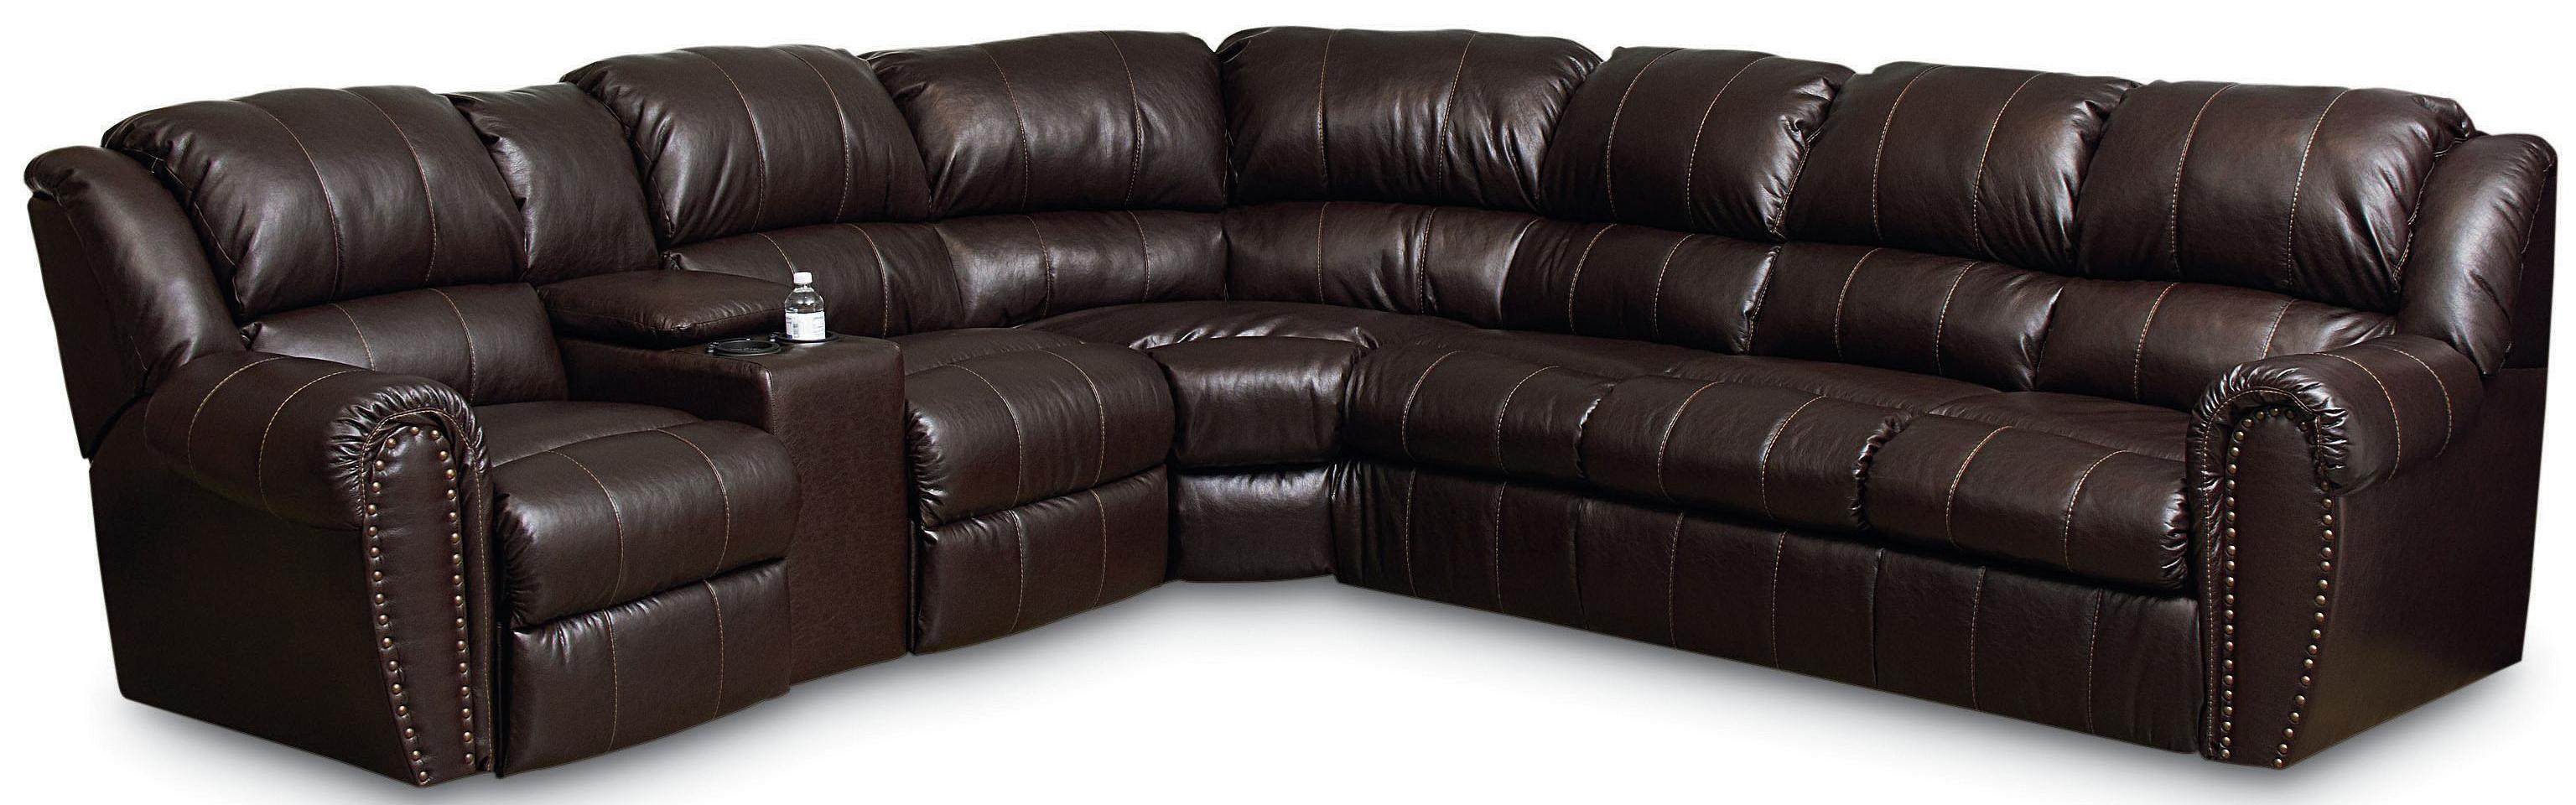 Genial Lane SummerlinSectional Sofa ...